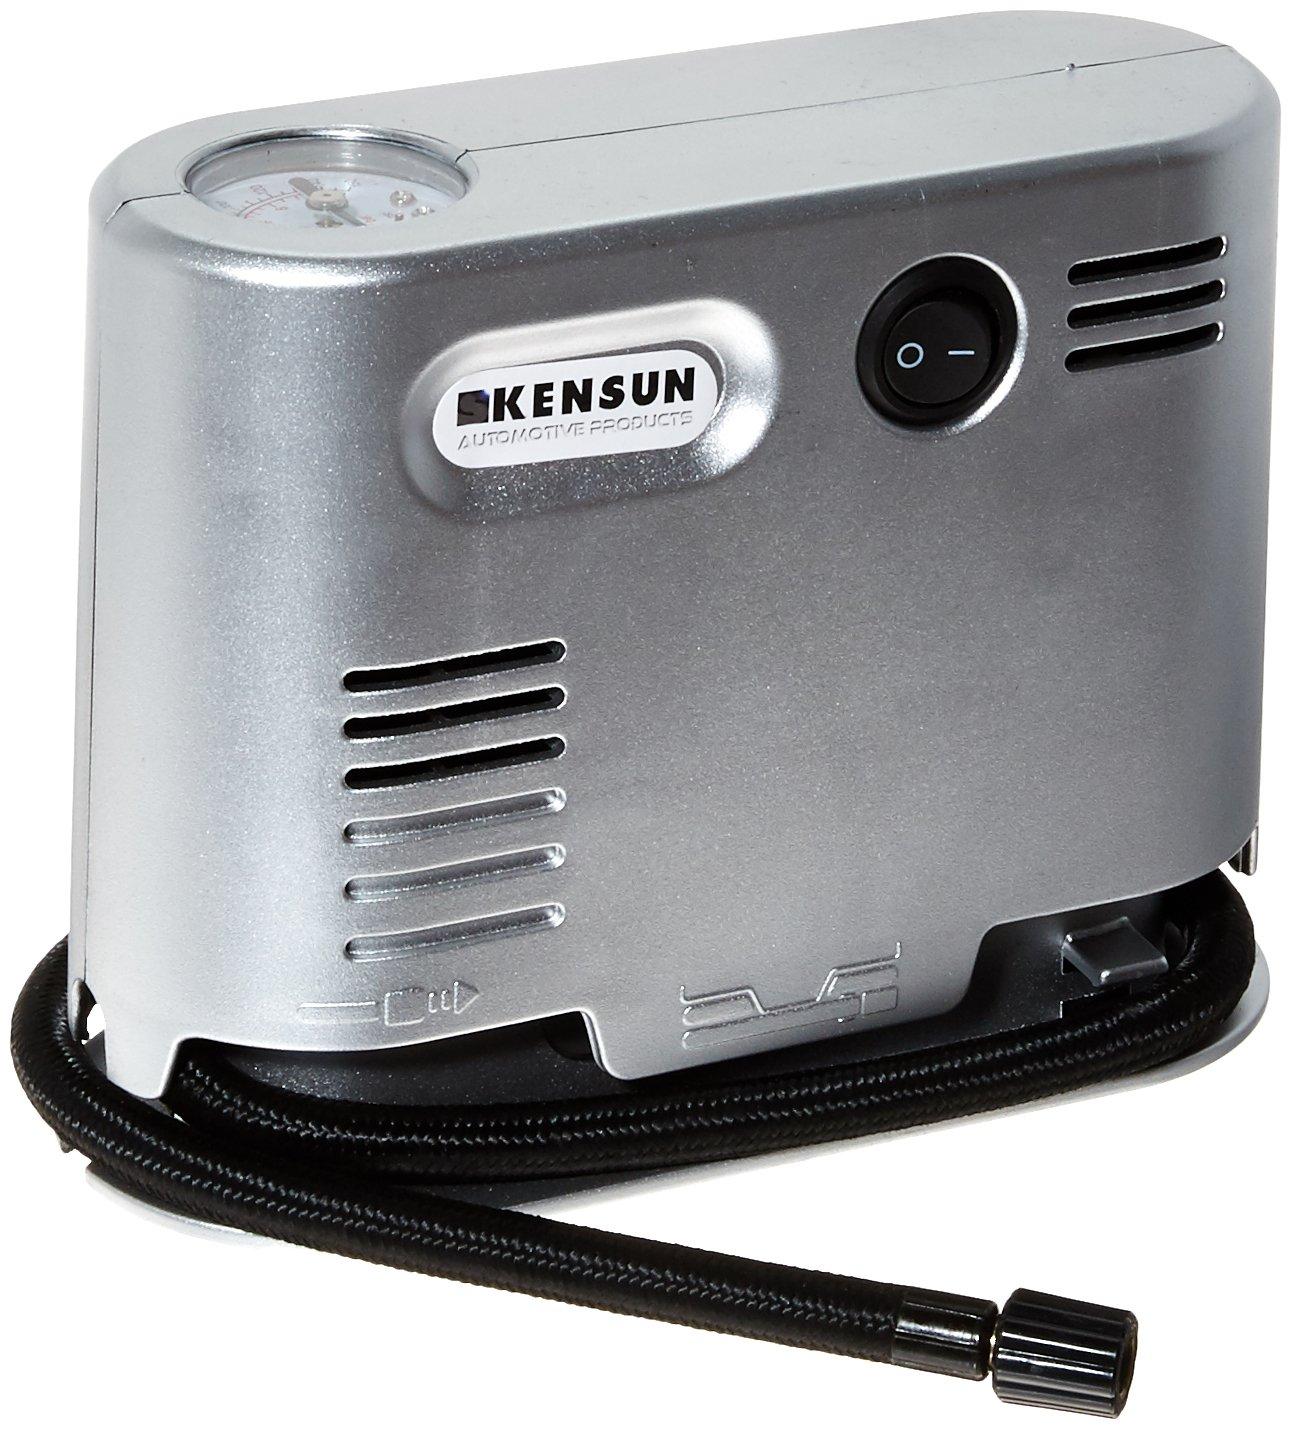 Kensun-PortAir-G High Pressure Air Compressor, Silver Kensun Portable Travel High Pressure Air Compressor//Inflator